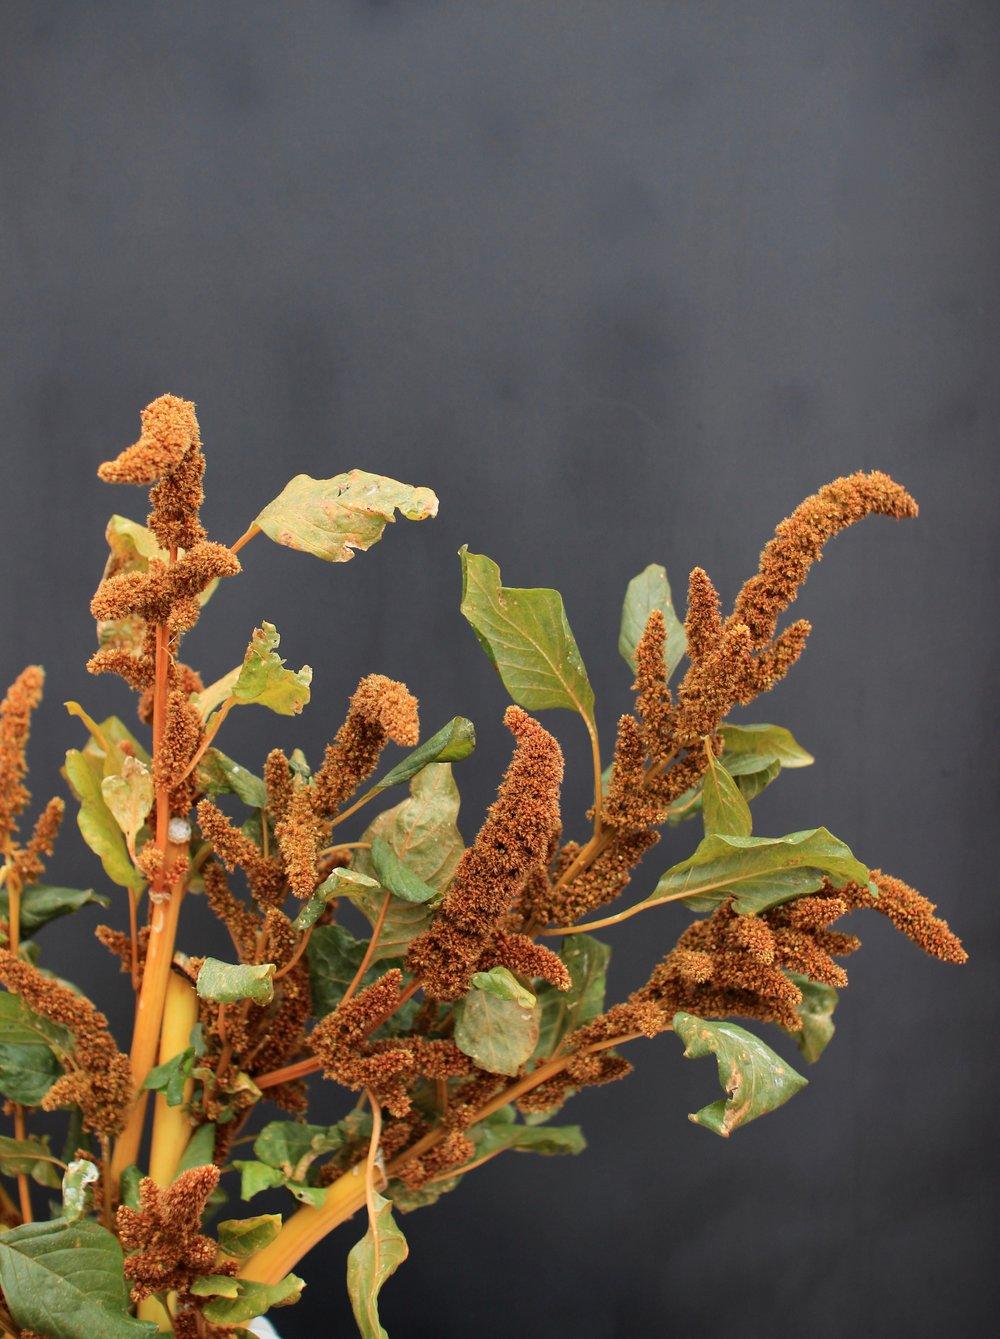 UPRIGHT AMARANTHUS, brown